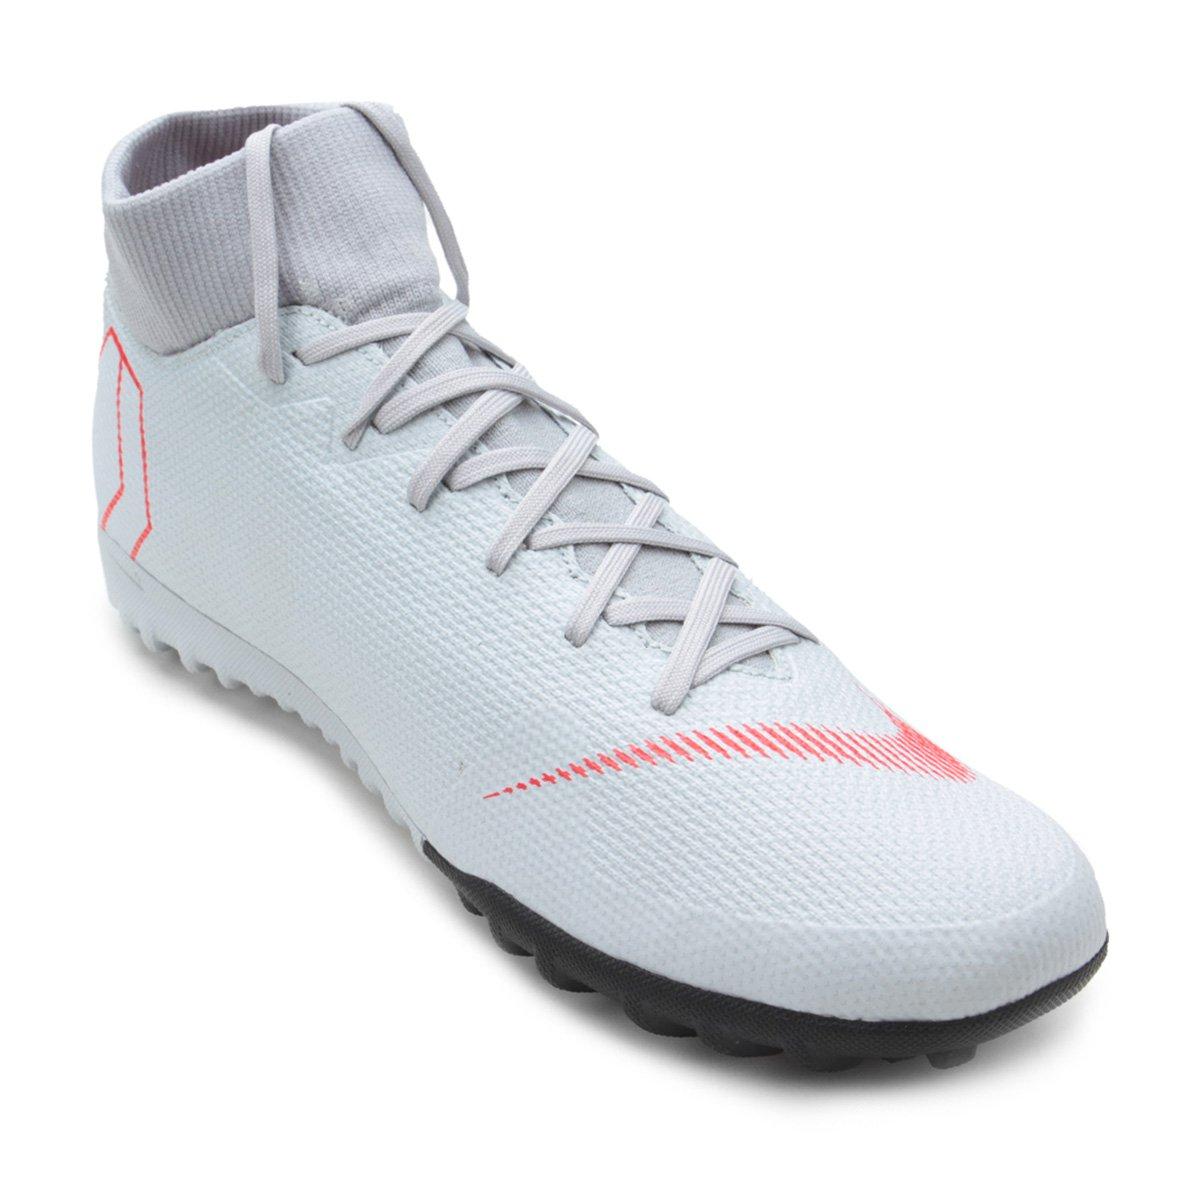 4e6a9be488 Chuteira Society Nike Mercurial Superfly 6 Academy - Cinza